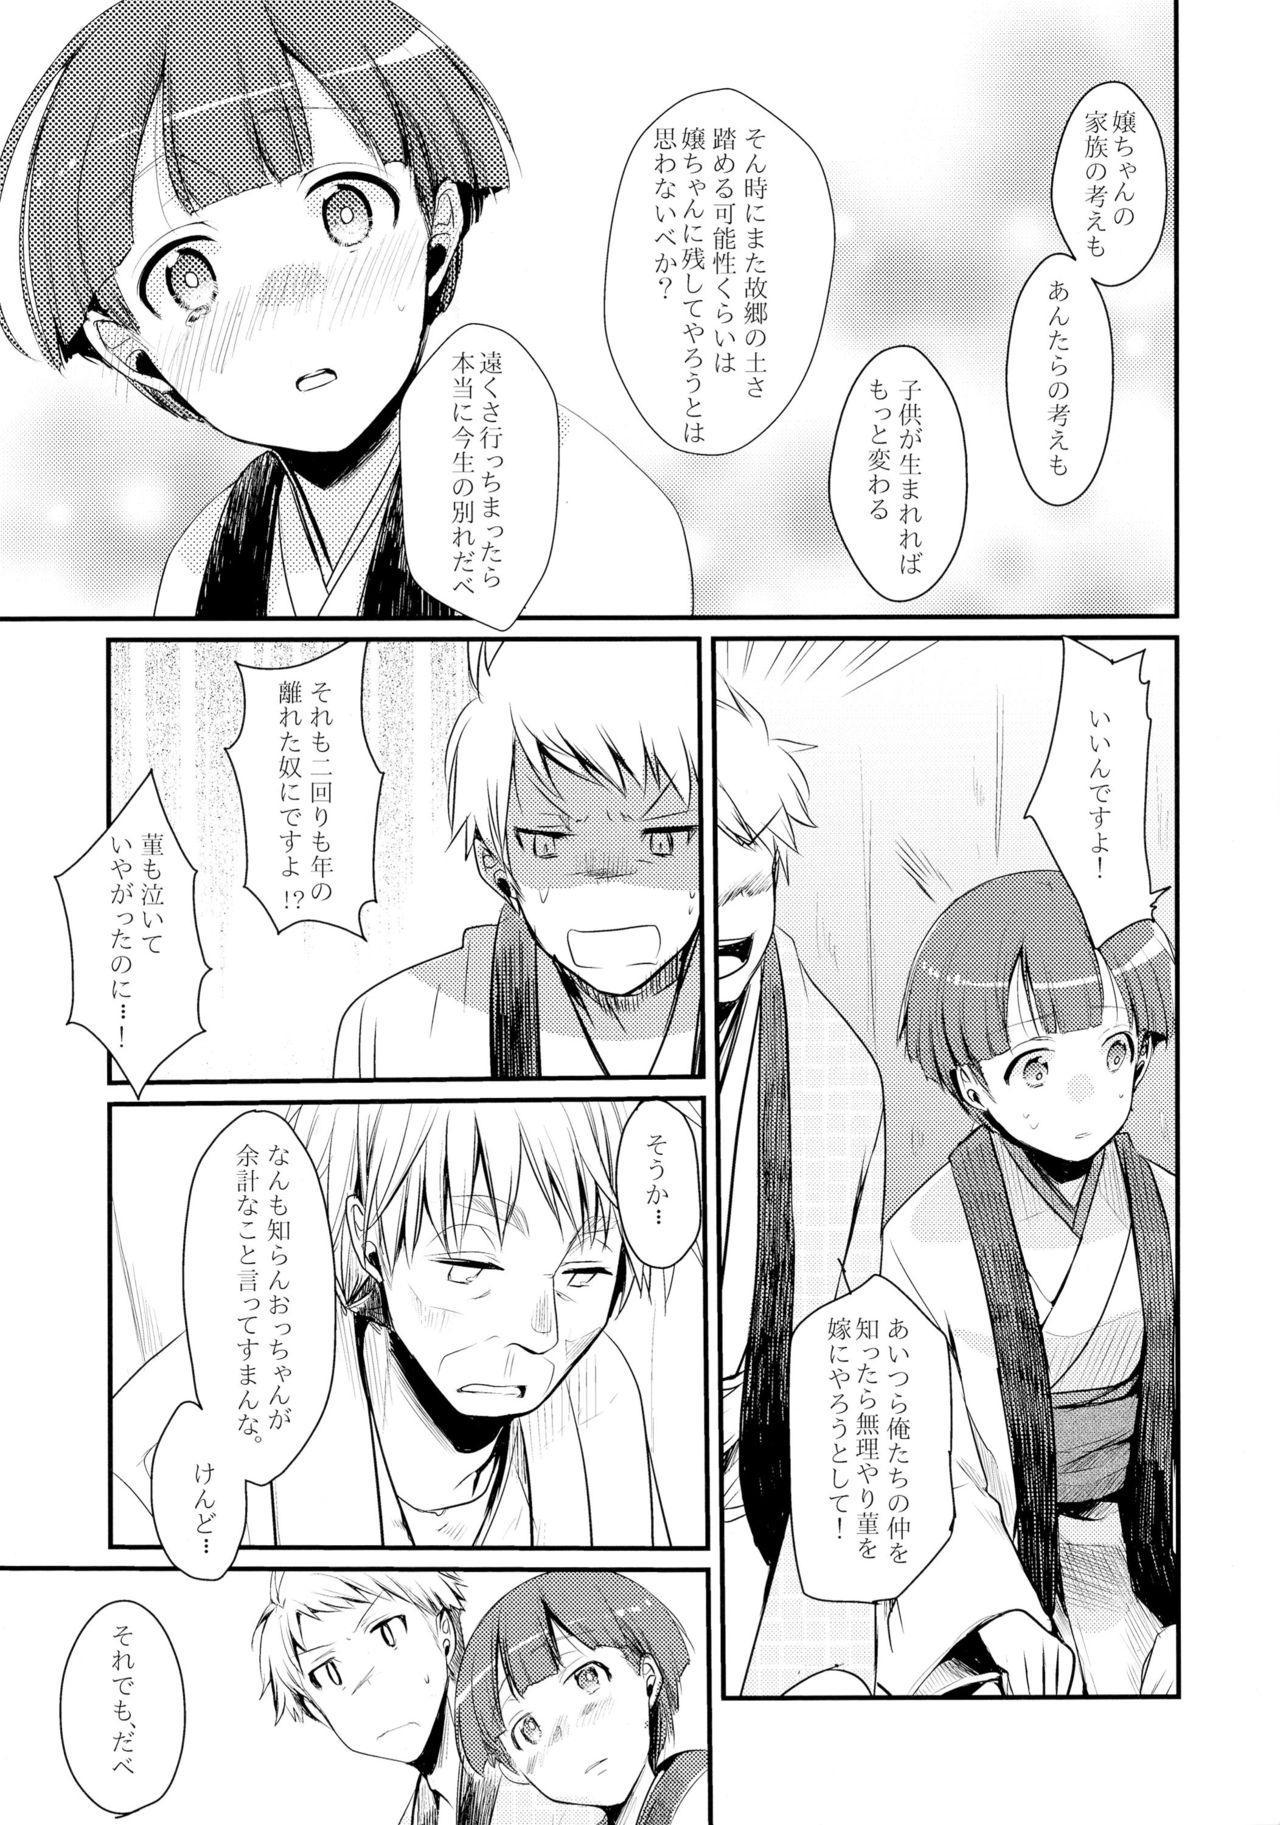 Kakeochi Shoujo Netorare 8